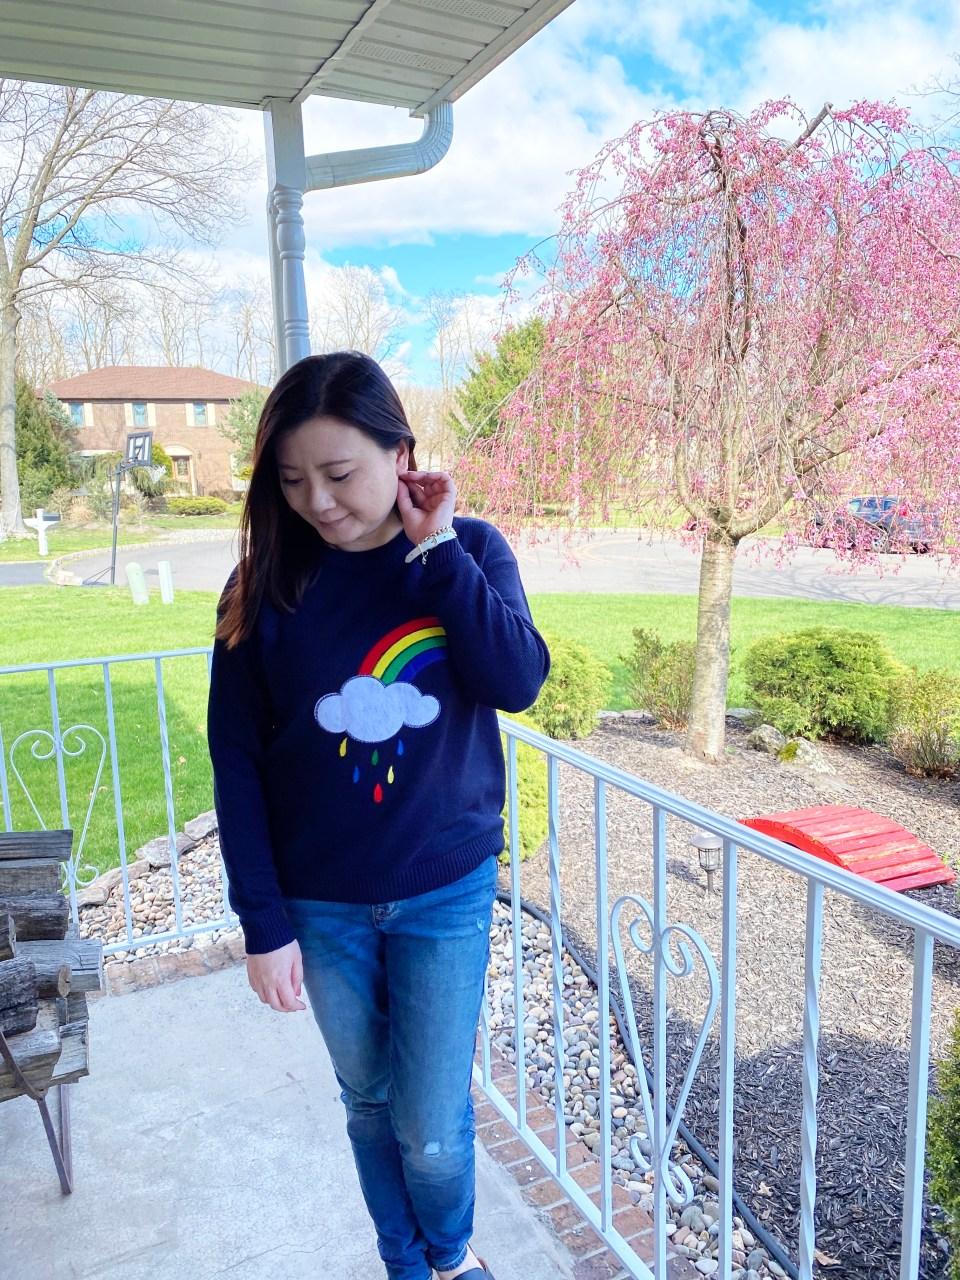 Rainbow & Cloud Sweater 2